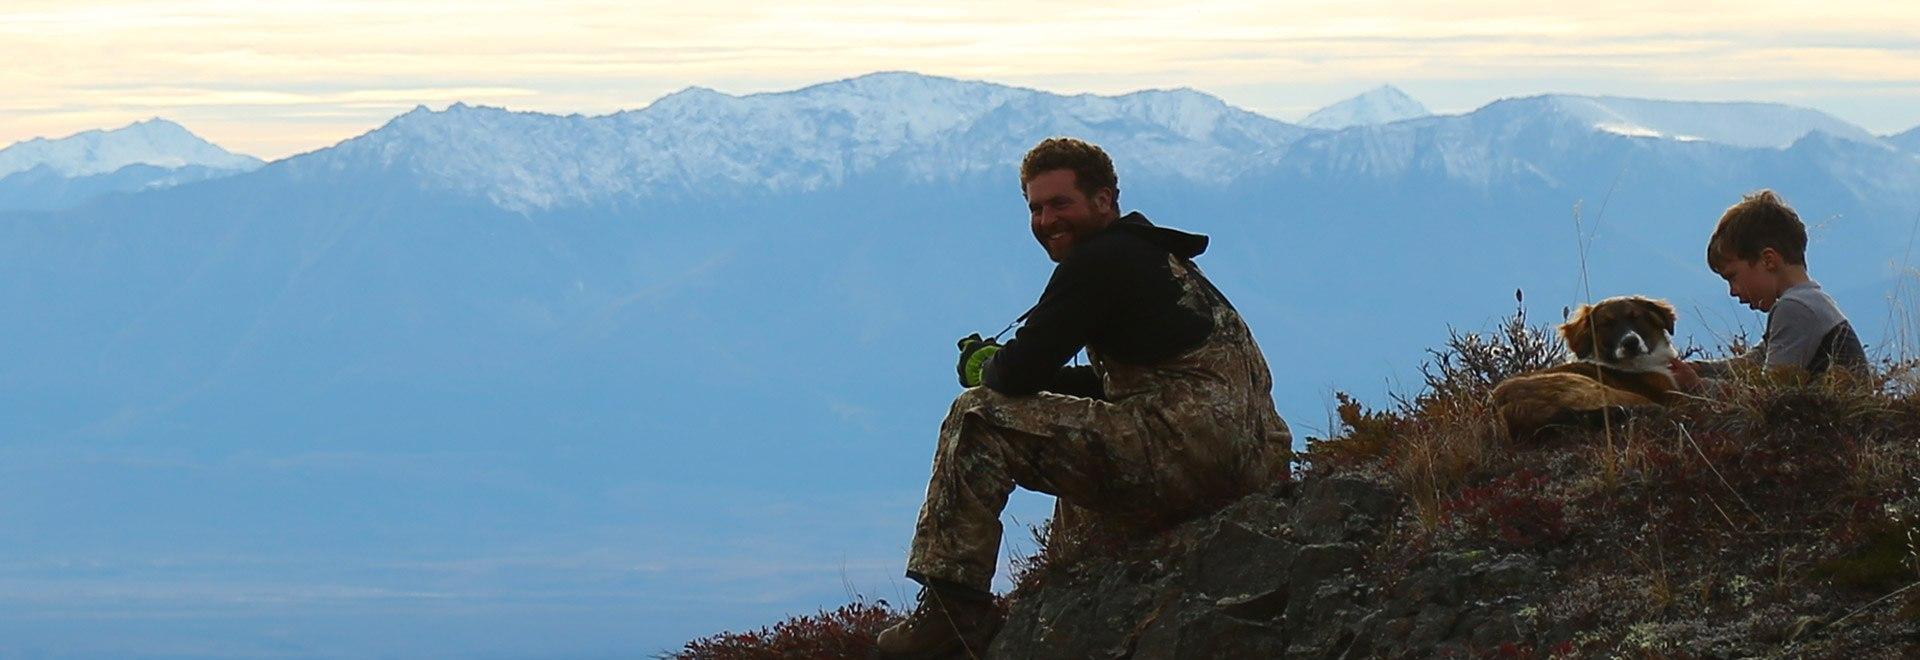 Alaska: i nuovi pionieri